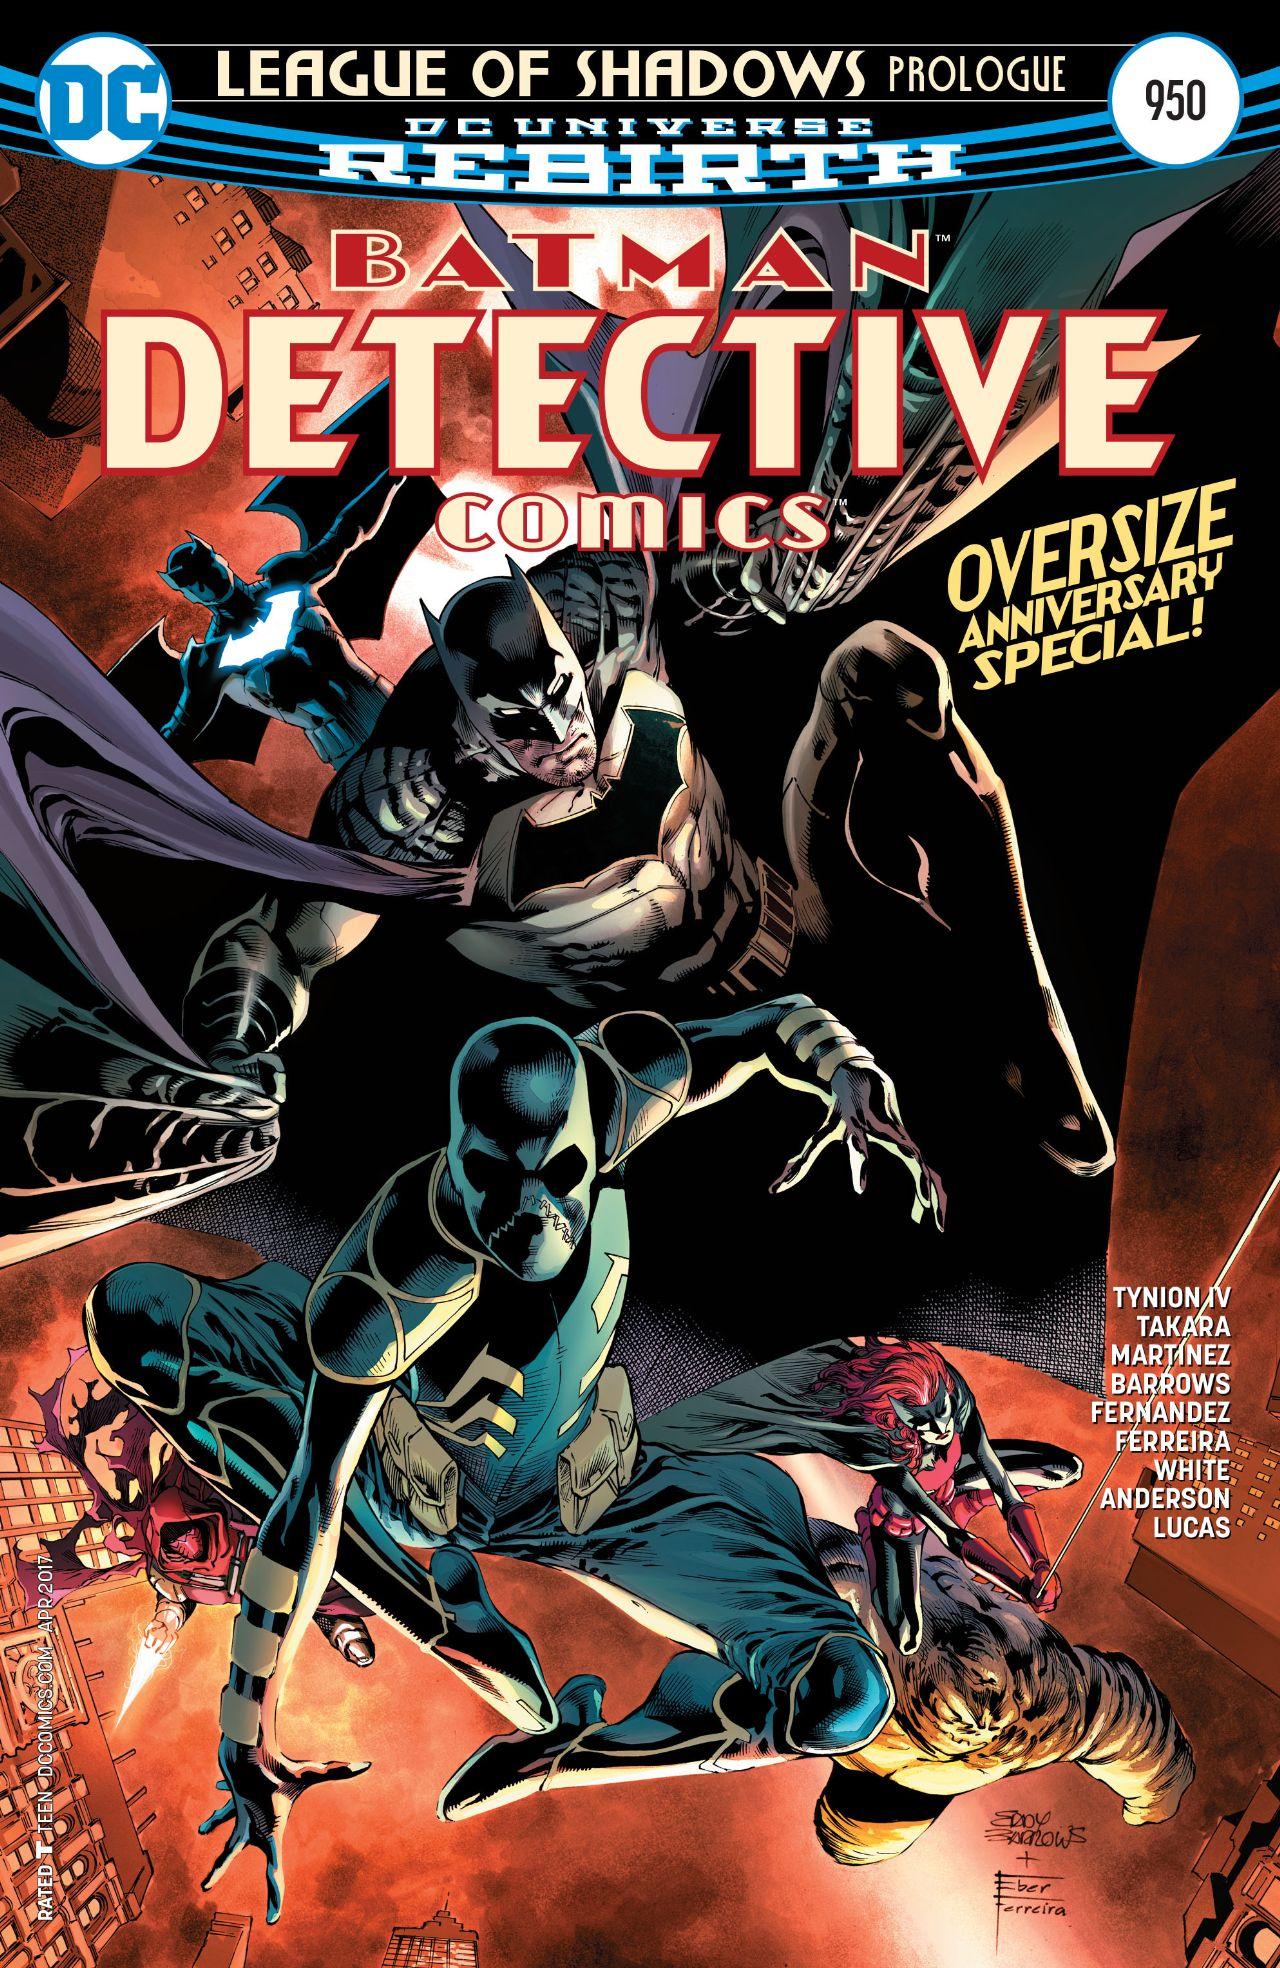 detective950.jpg